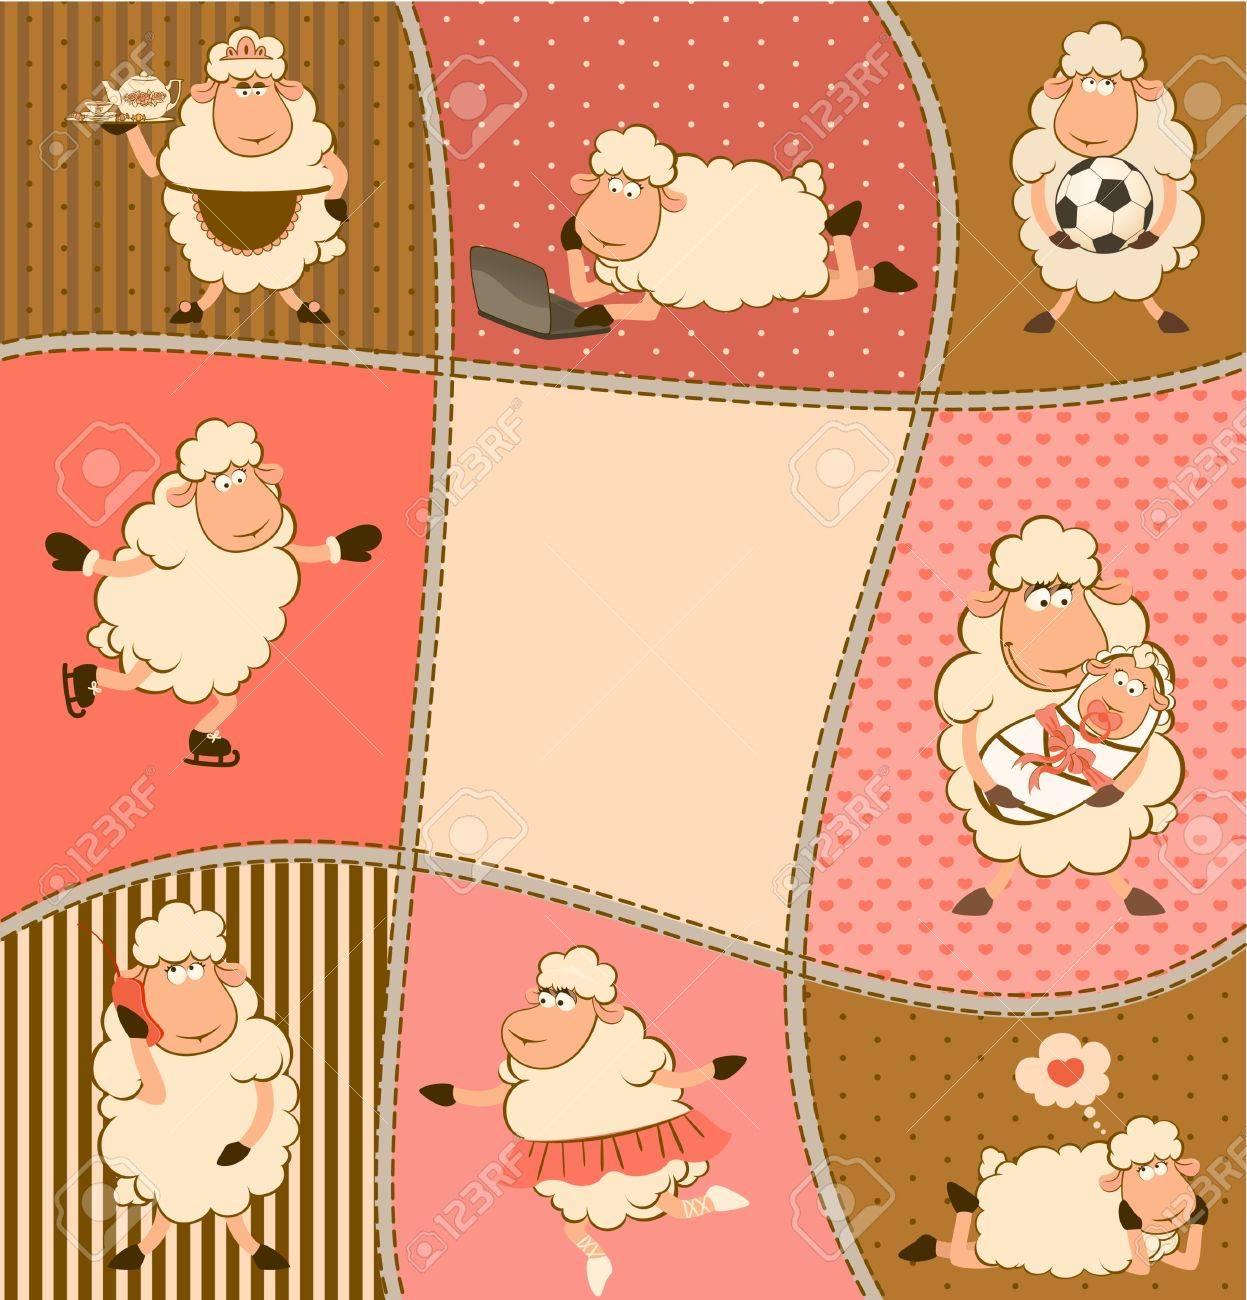 illustration of cartoon sheep Stock Photo - 10608811